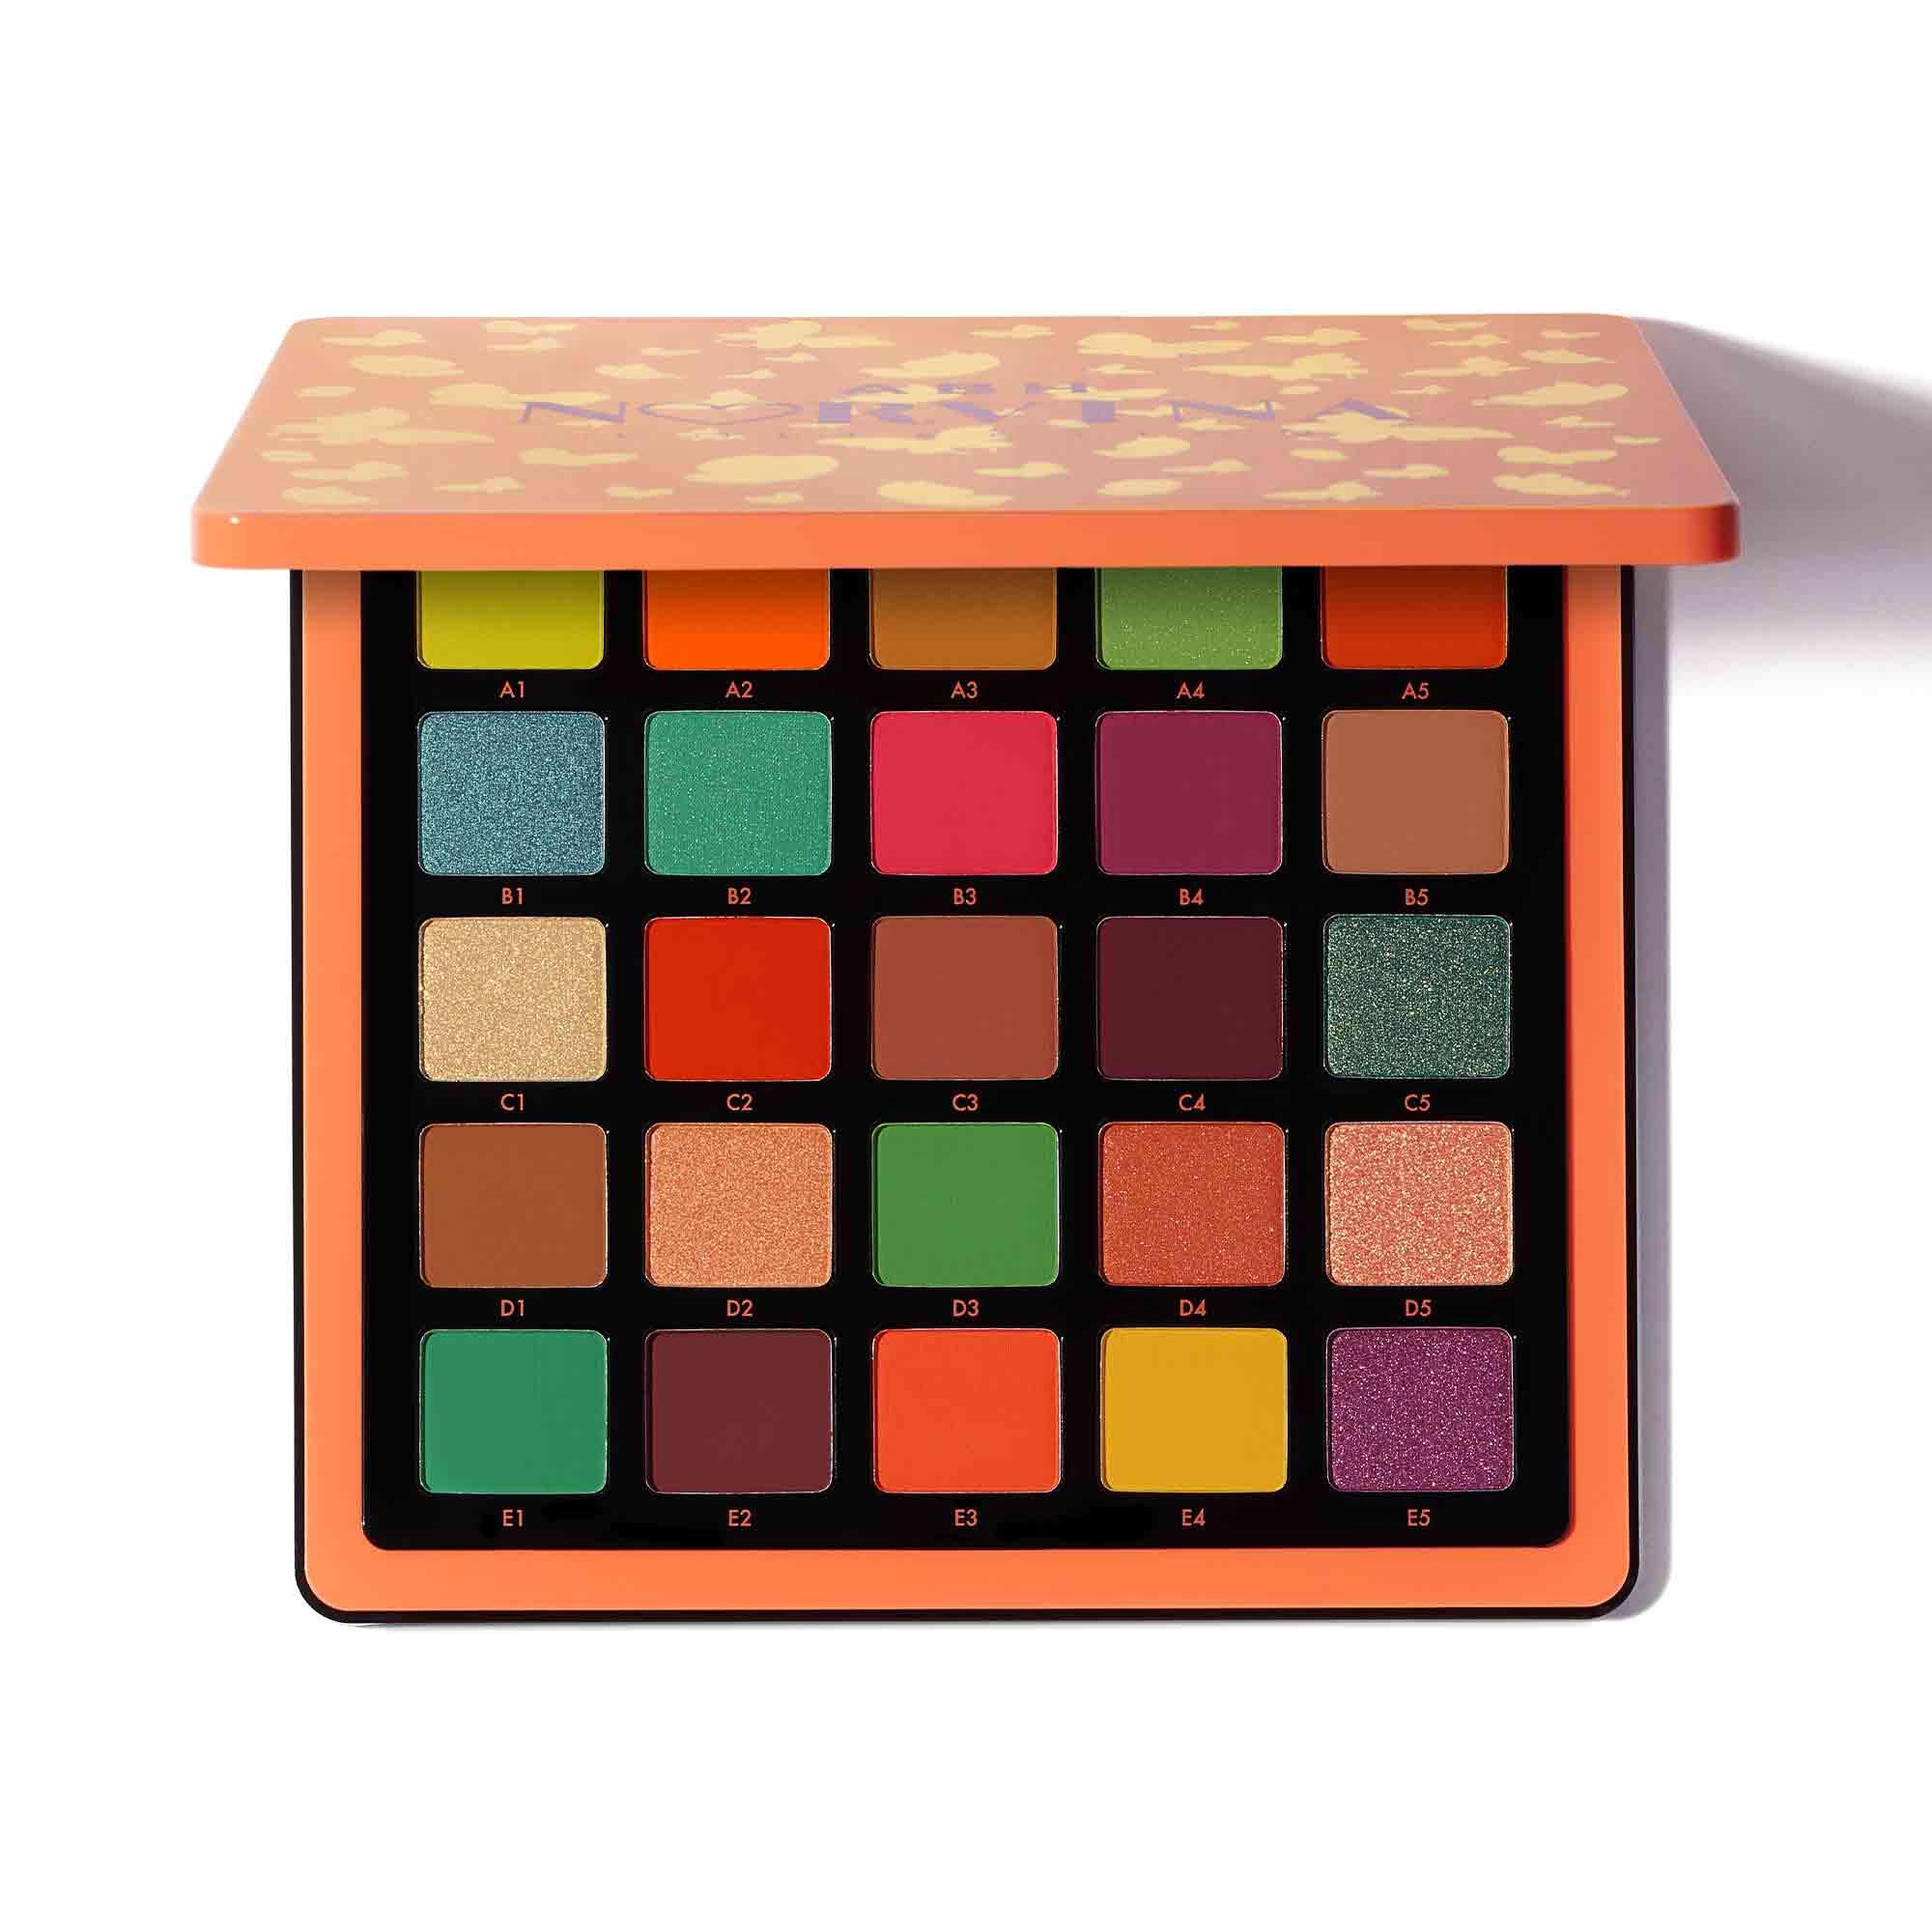 ANASTASIA BEVERLY HILLS Norvina® Pro Pigment Palette Vol. 3 $42